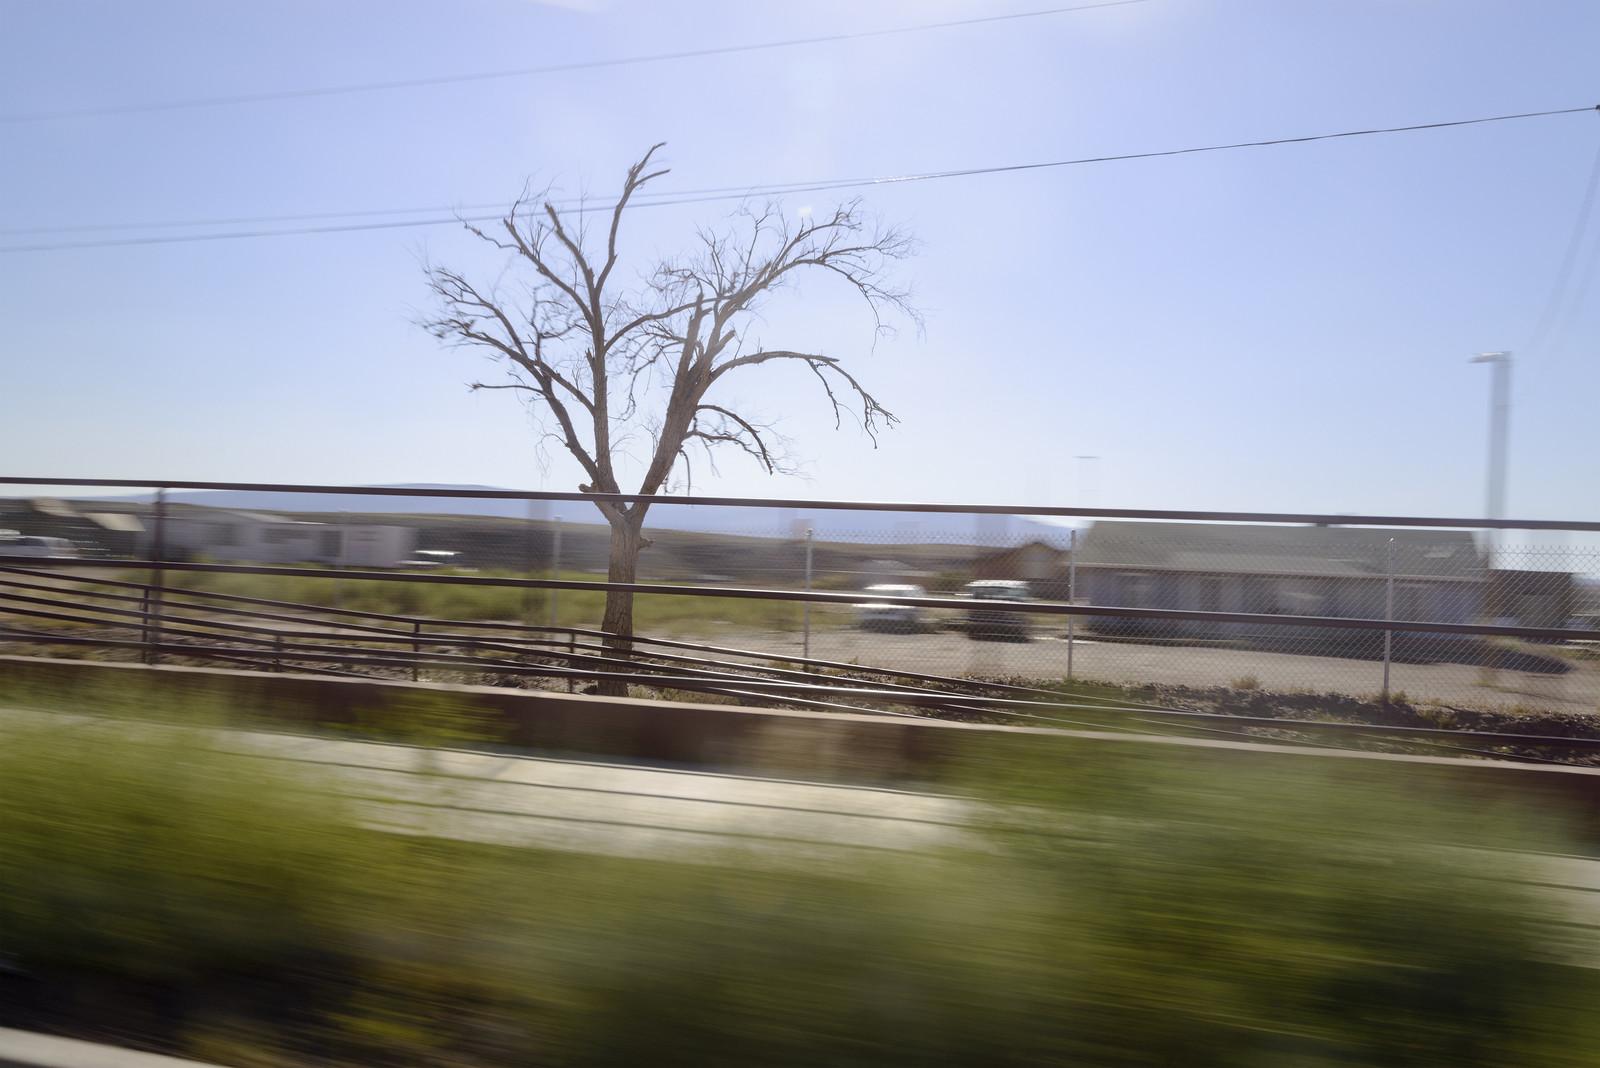 Near Cameron, Arizona   by GC_Dean